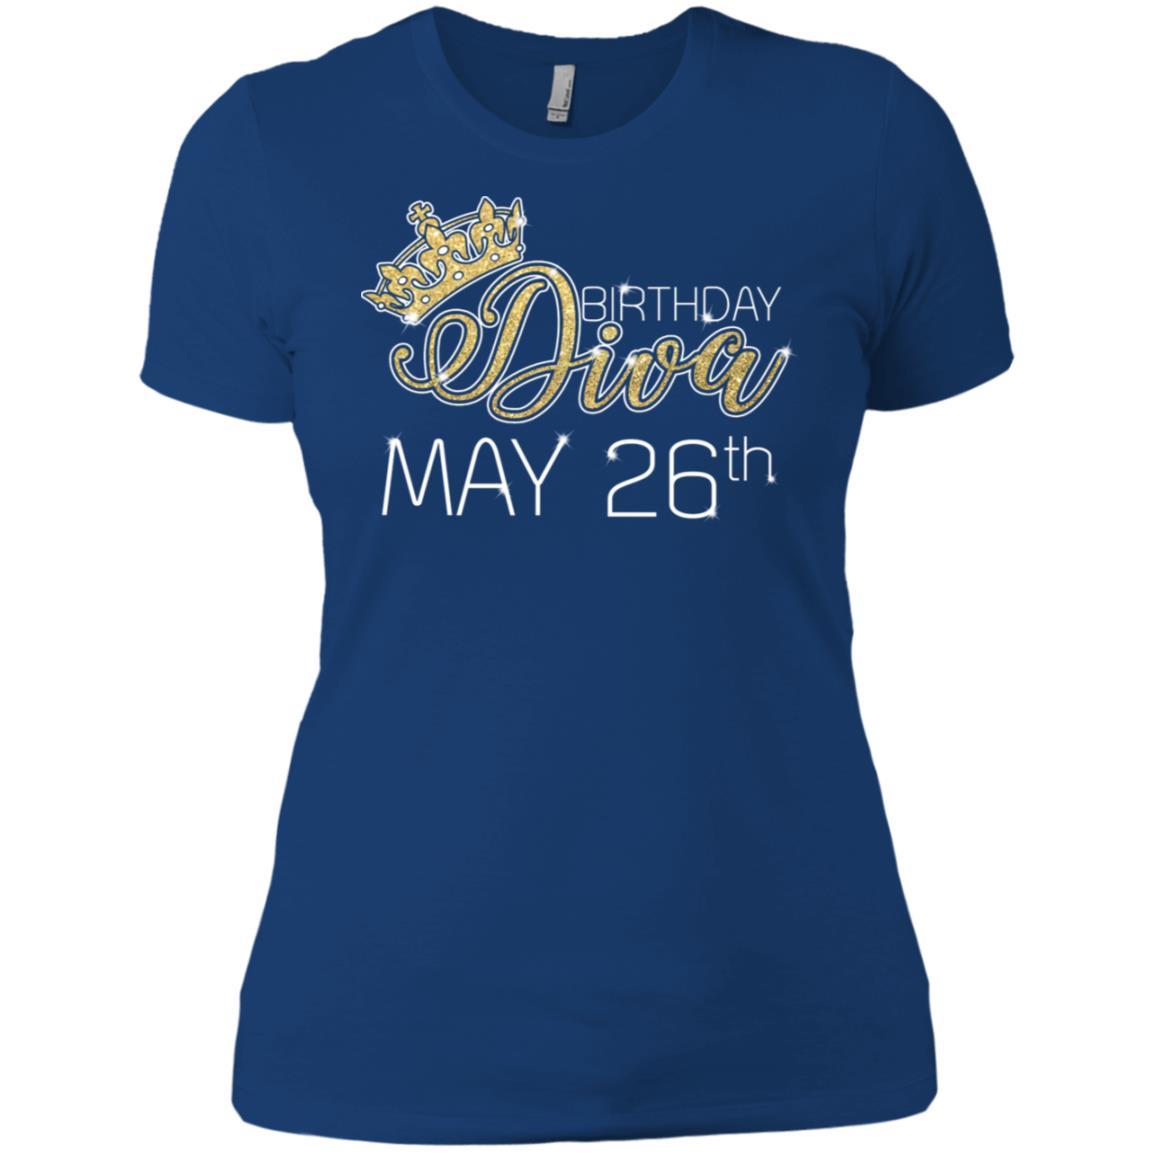 Birthday Diva on May 26th Taurus Pride Women Short Sleeve